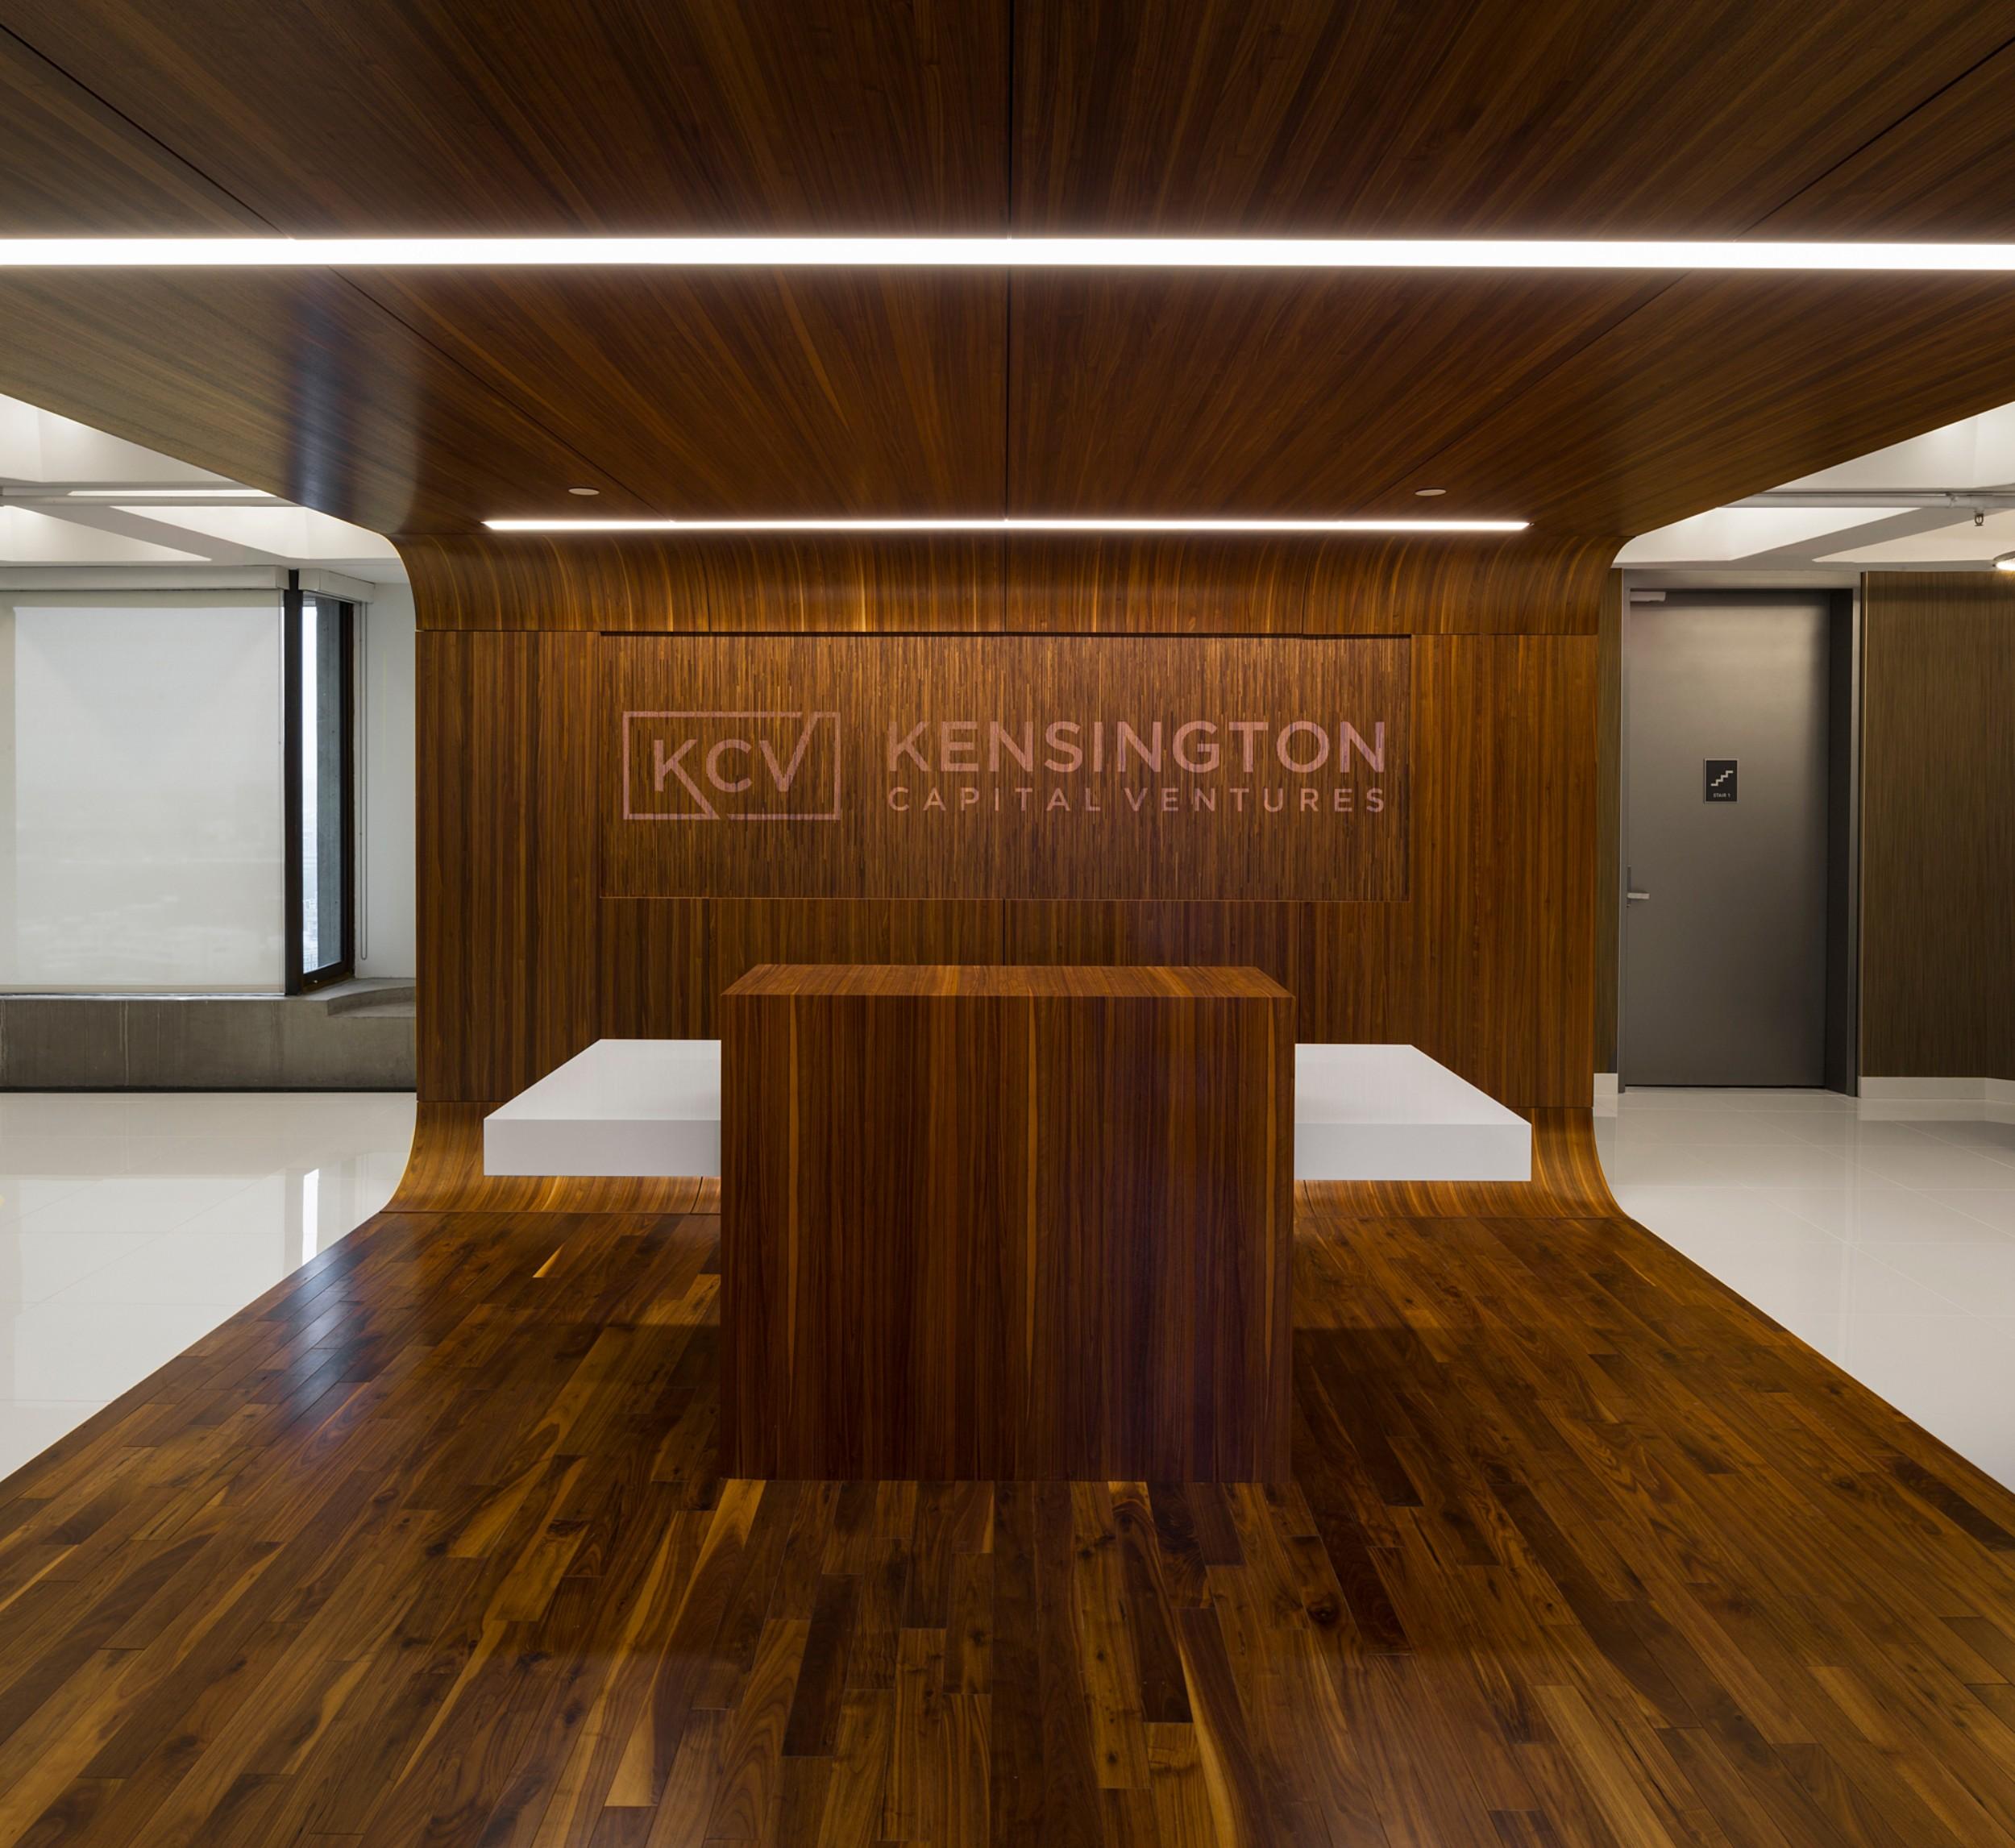 Kensington_Capital_Ventures_Holdings_Corderman_Construction_Office_Finance_Boston_Reception_Logo_Millwork_Wall.jpg